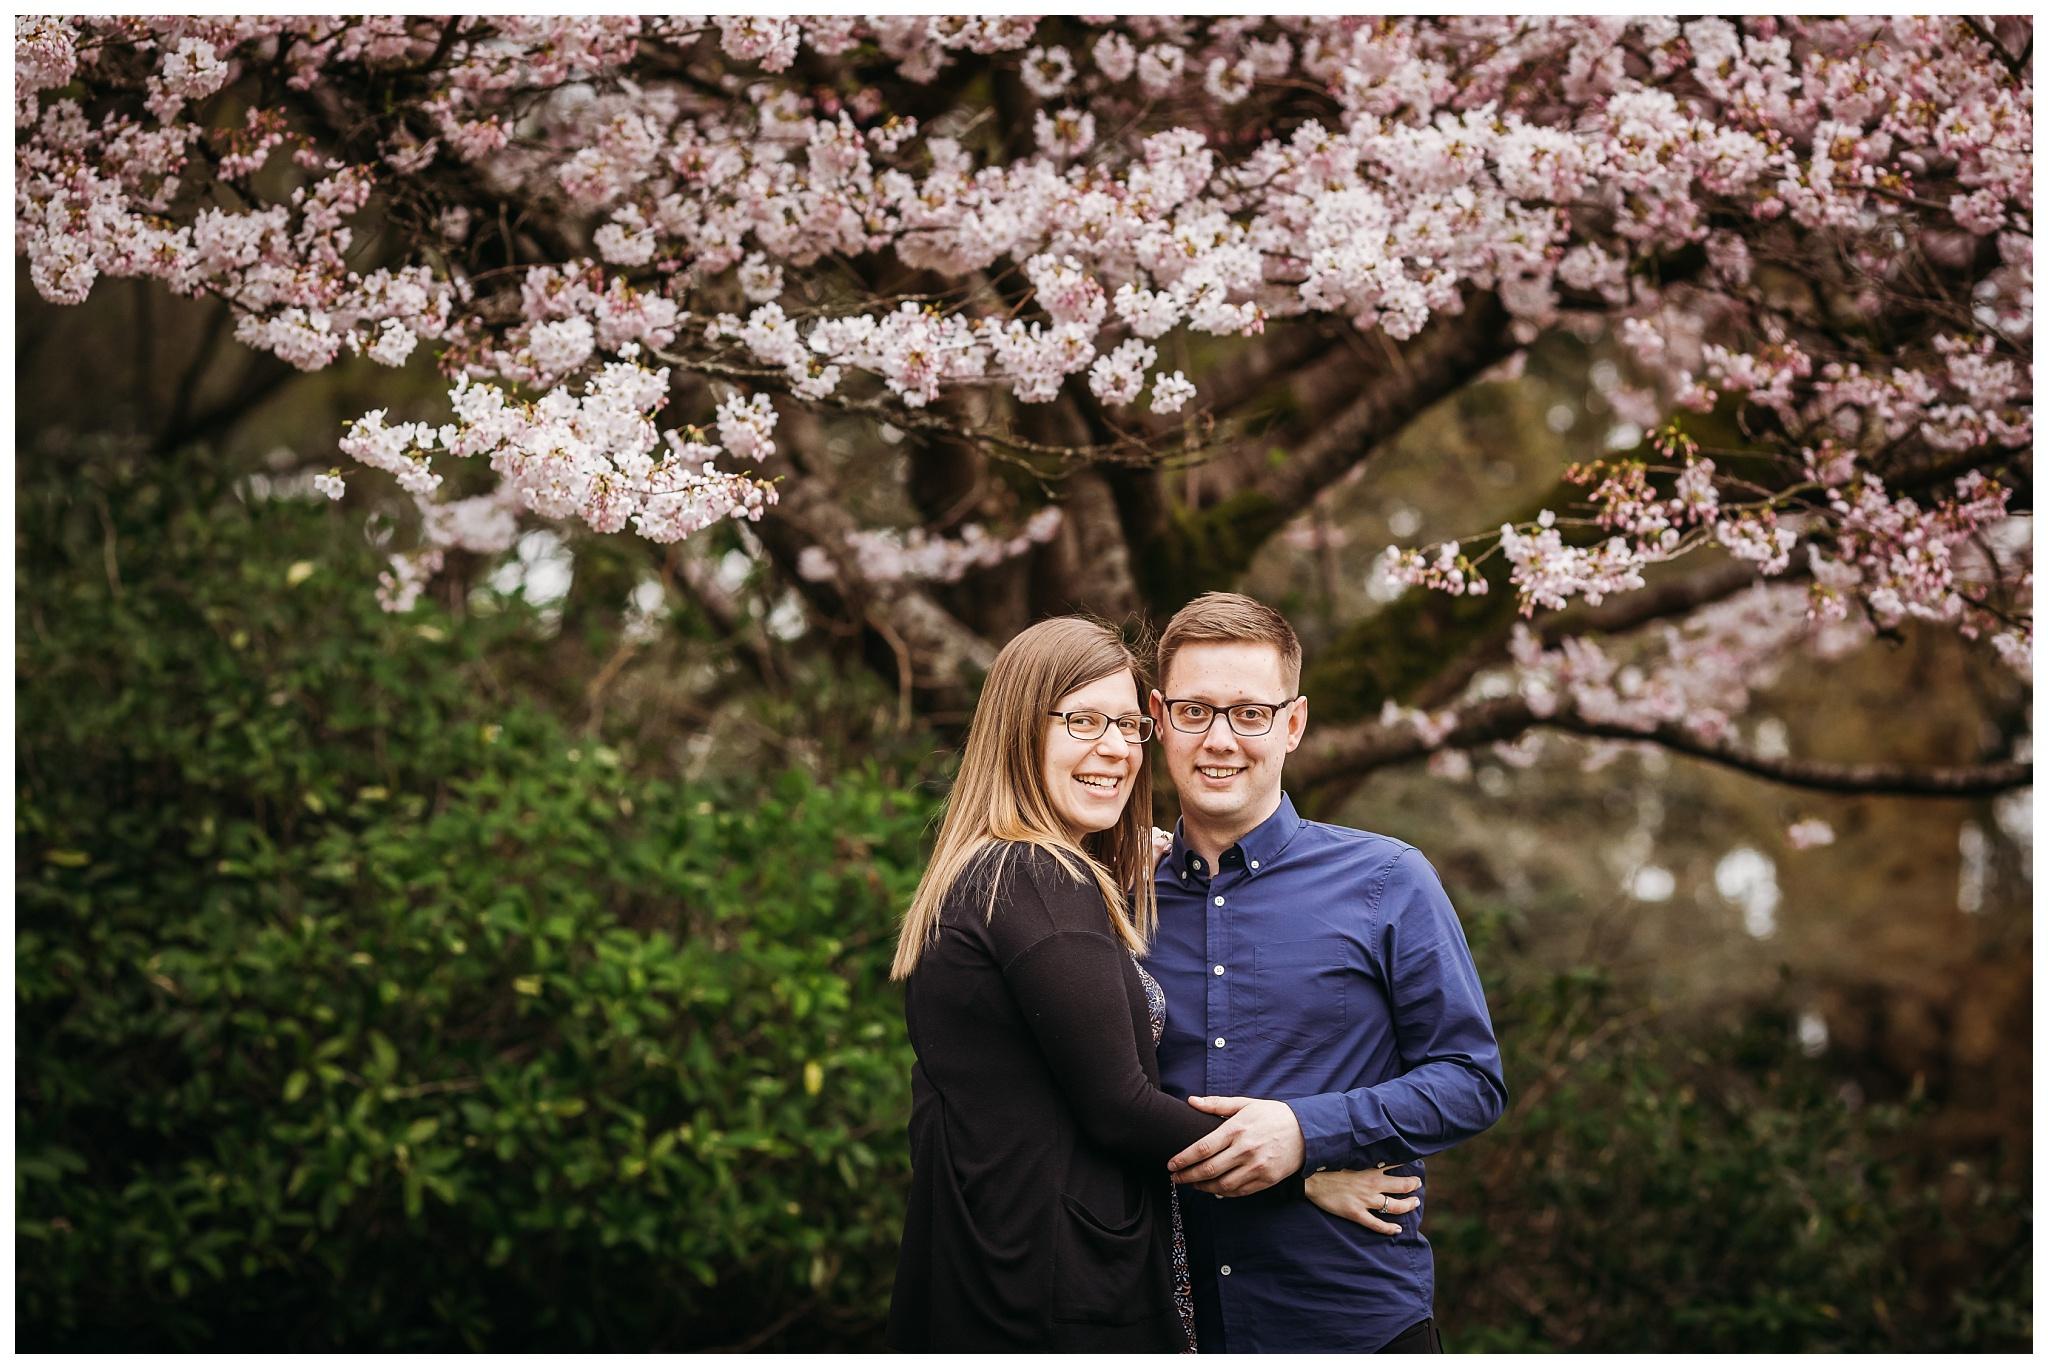 Queen Elizabeth Park Spring Engagement Photography Cherry Blossom Photos Couple Romantic_0002.jpg